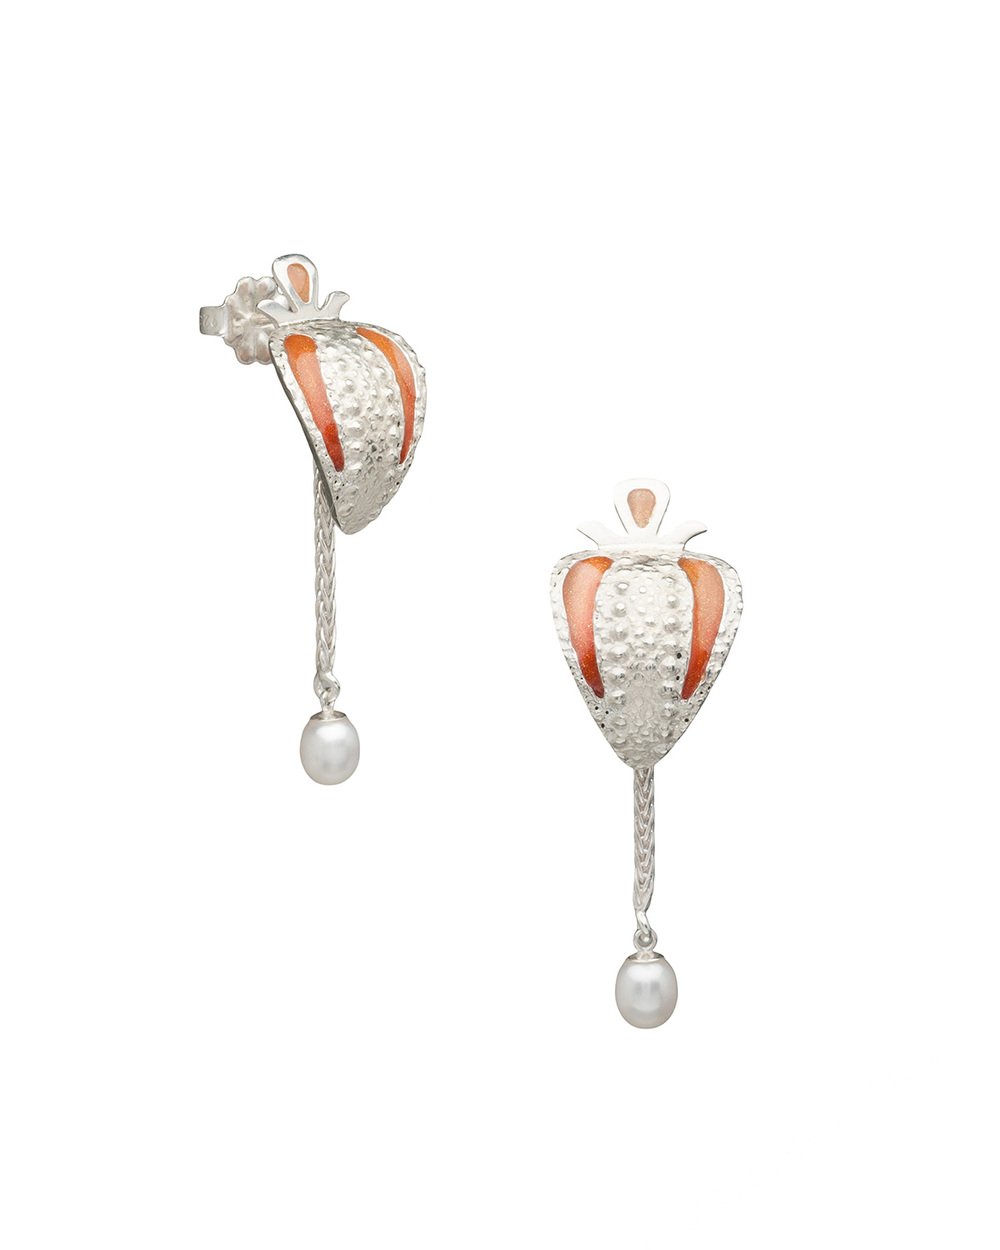 2015-10-Mary-Lynn-Podiluk-Argot-Earrings-P103a.jpg